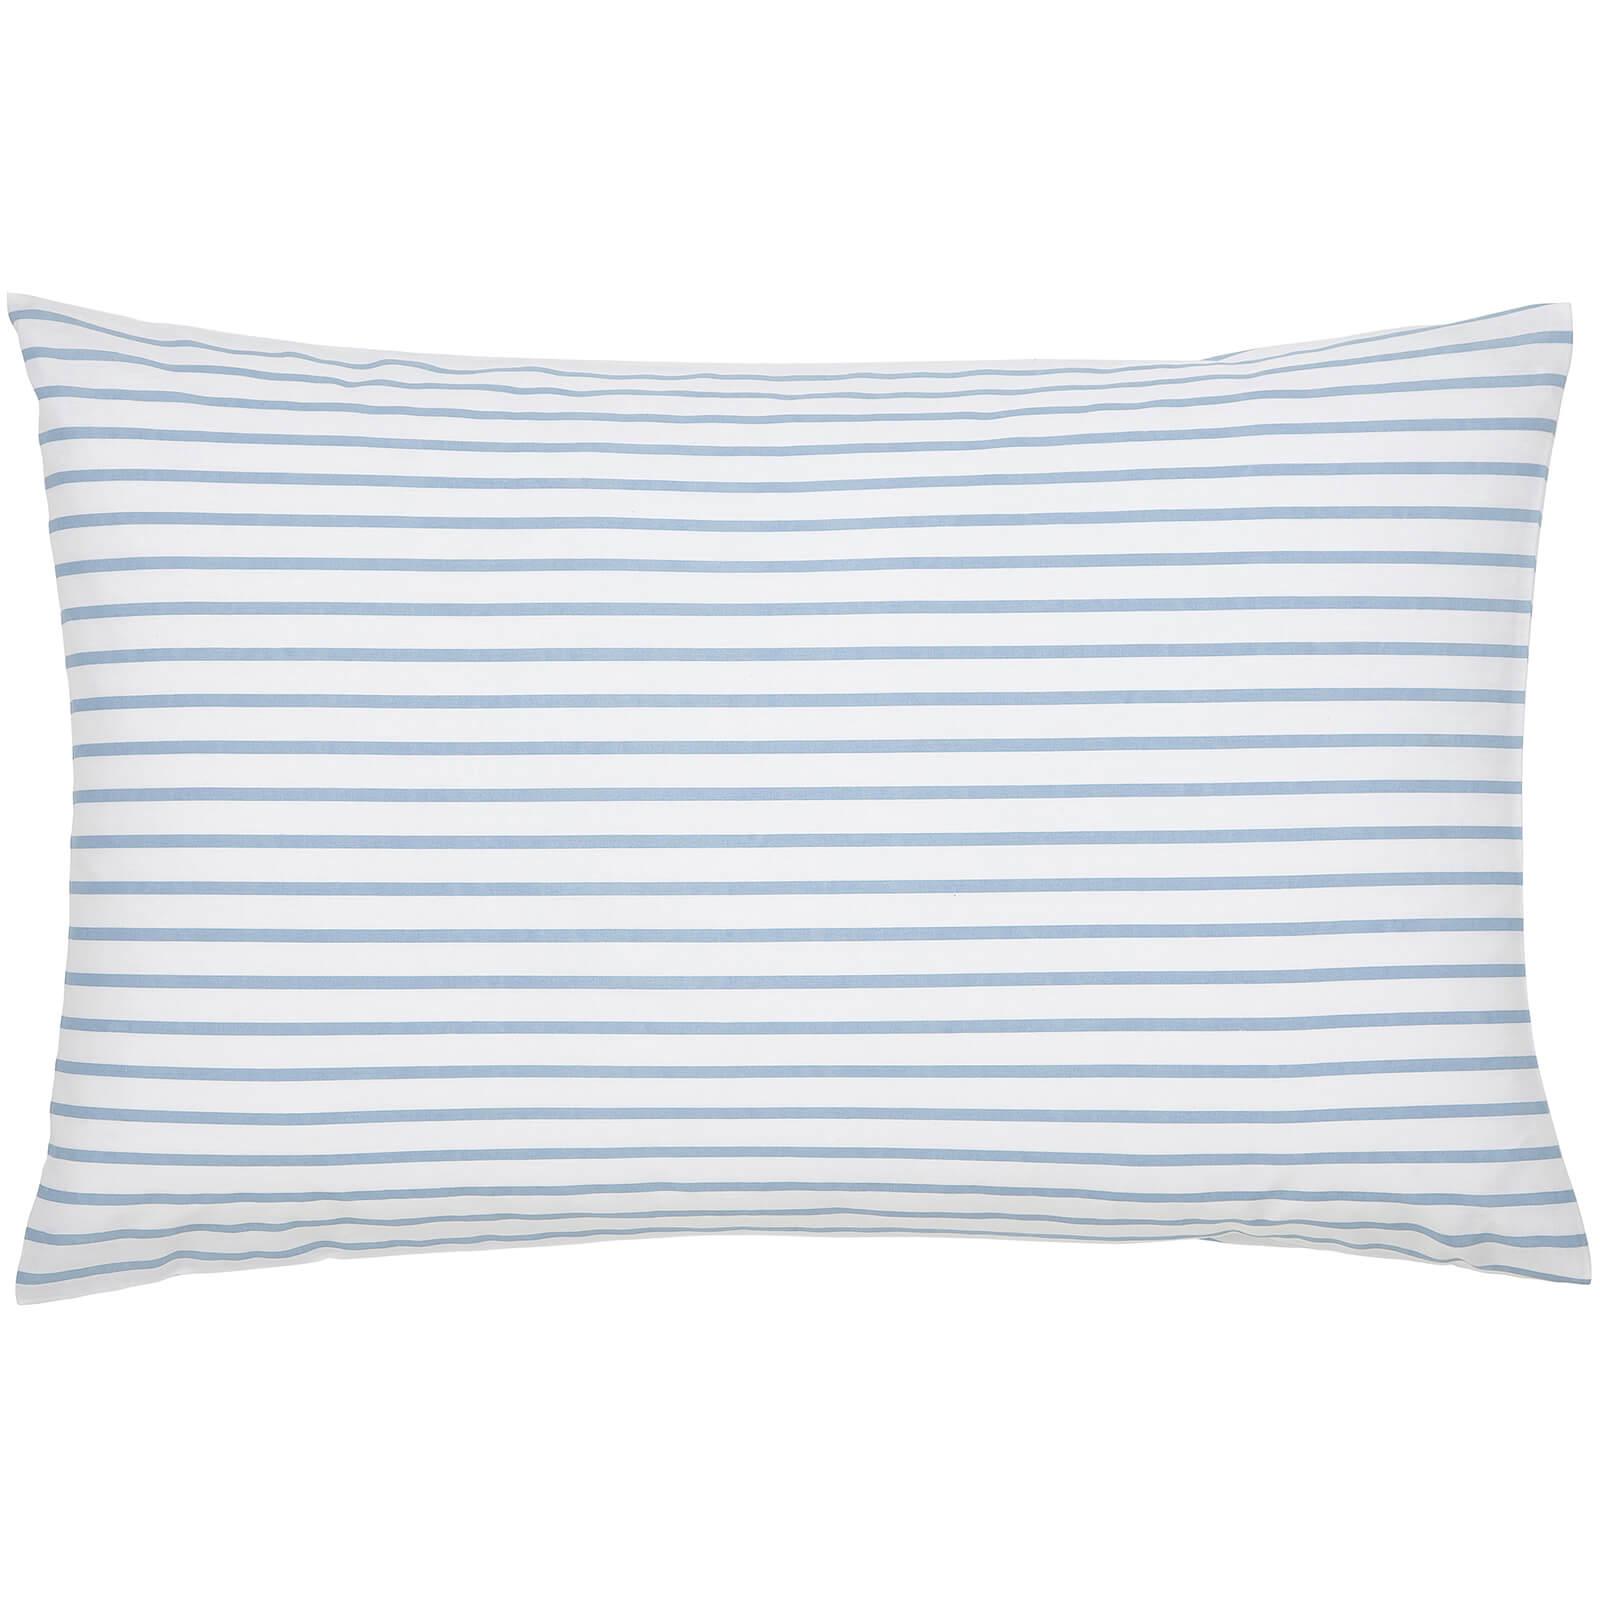 Joules Garden Dogs Standard Pillowcase - White